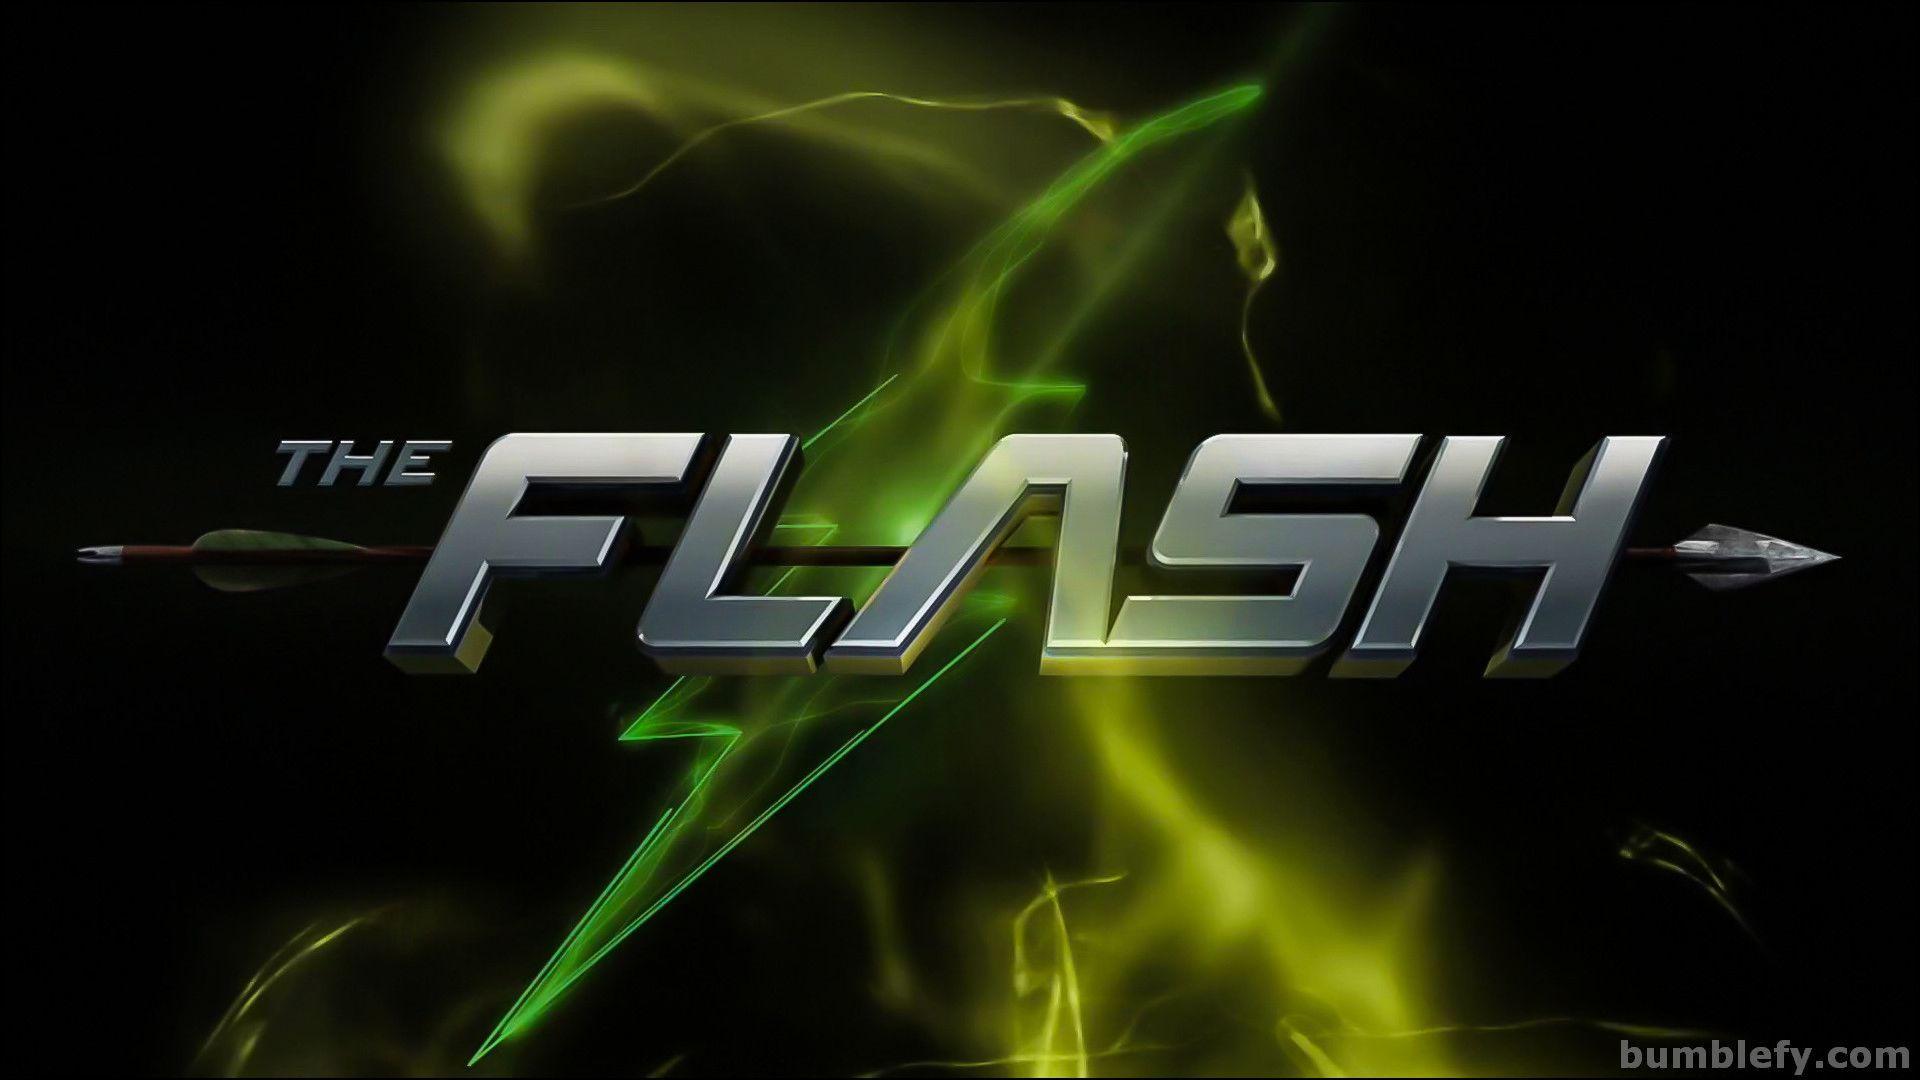 1280x2120 Flash Vs Arrow IPhone 6 HD 4k Wallpapers Images